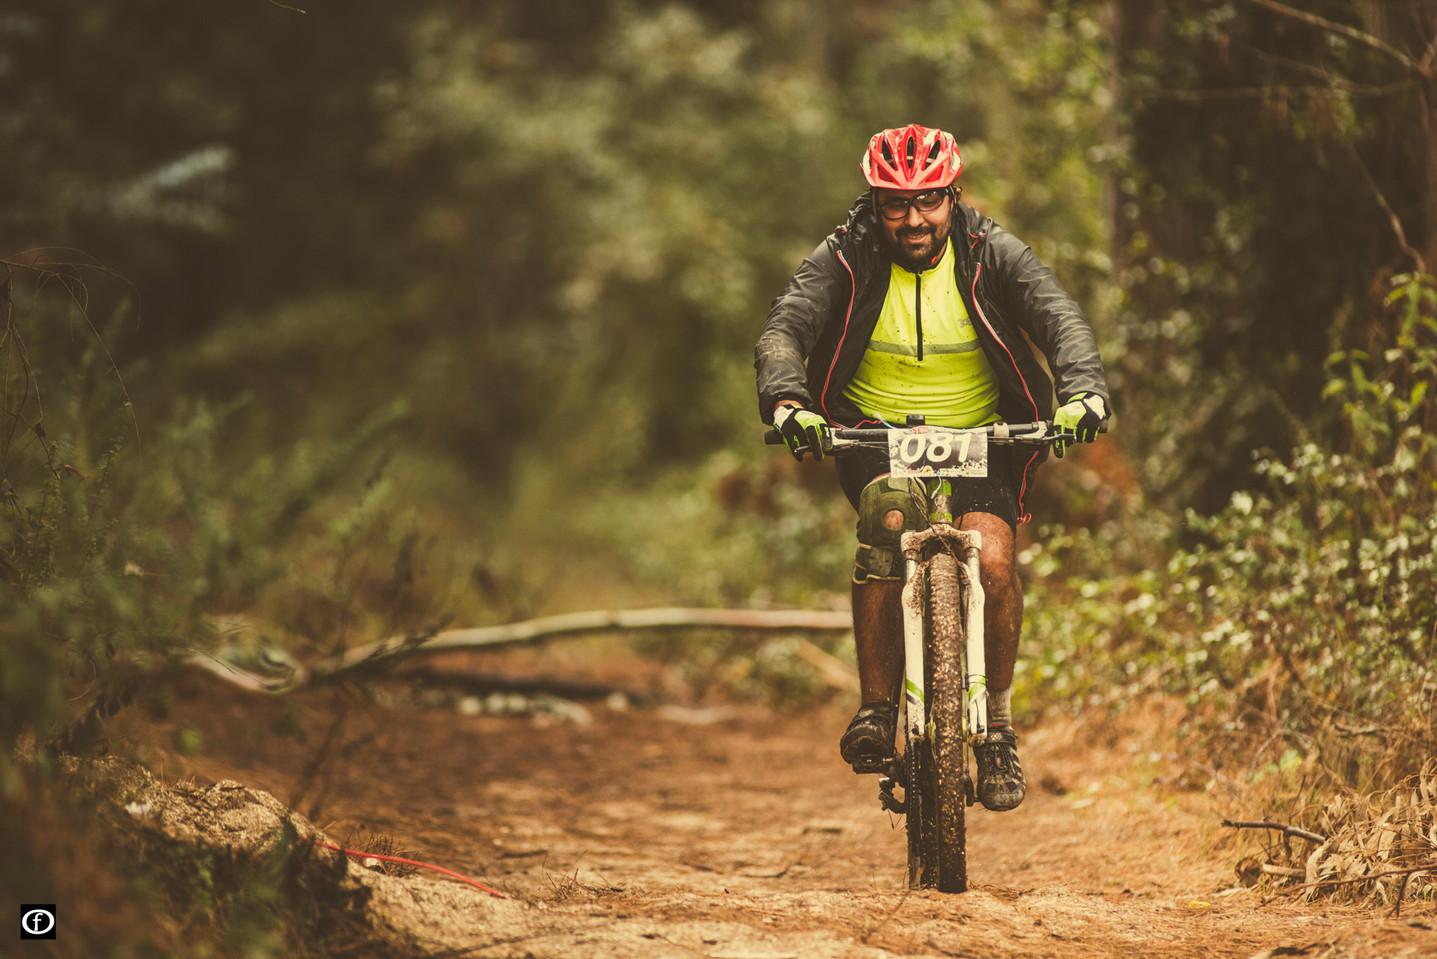 2015-05-17-Ciclismo Enduro-72.jpg